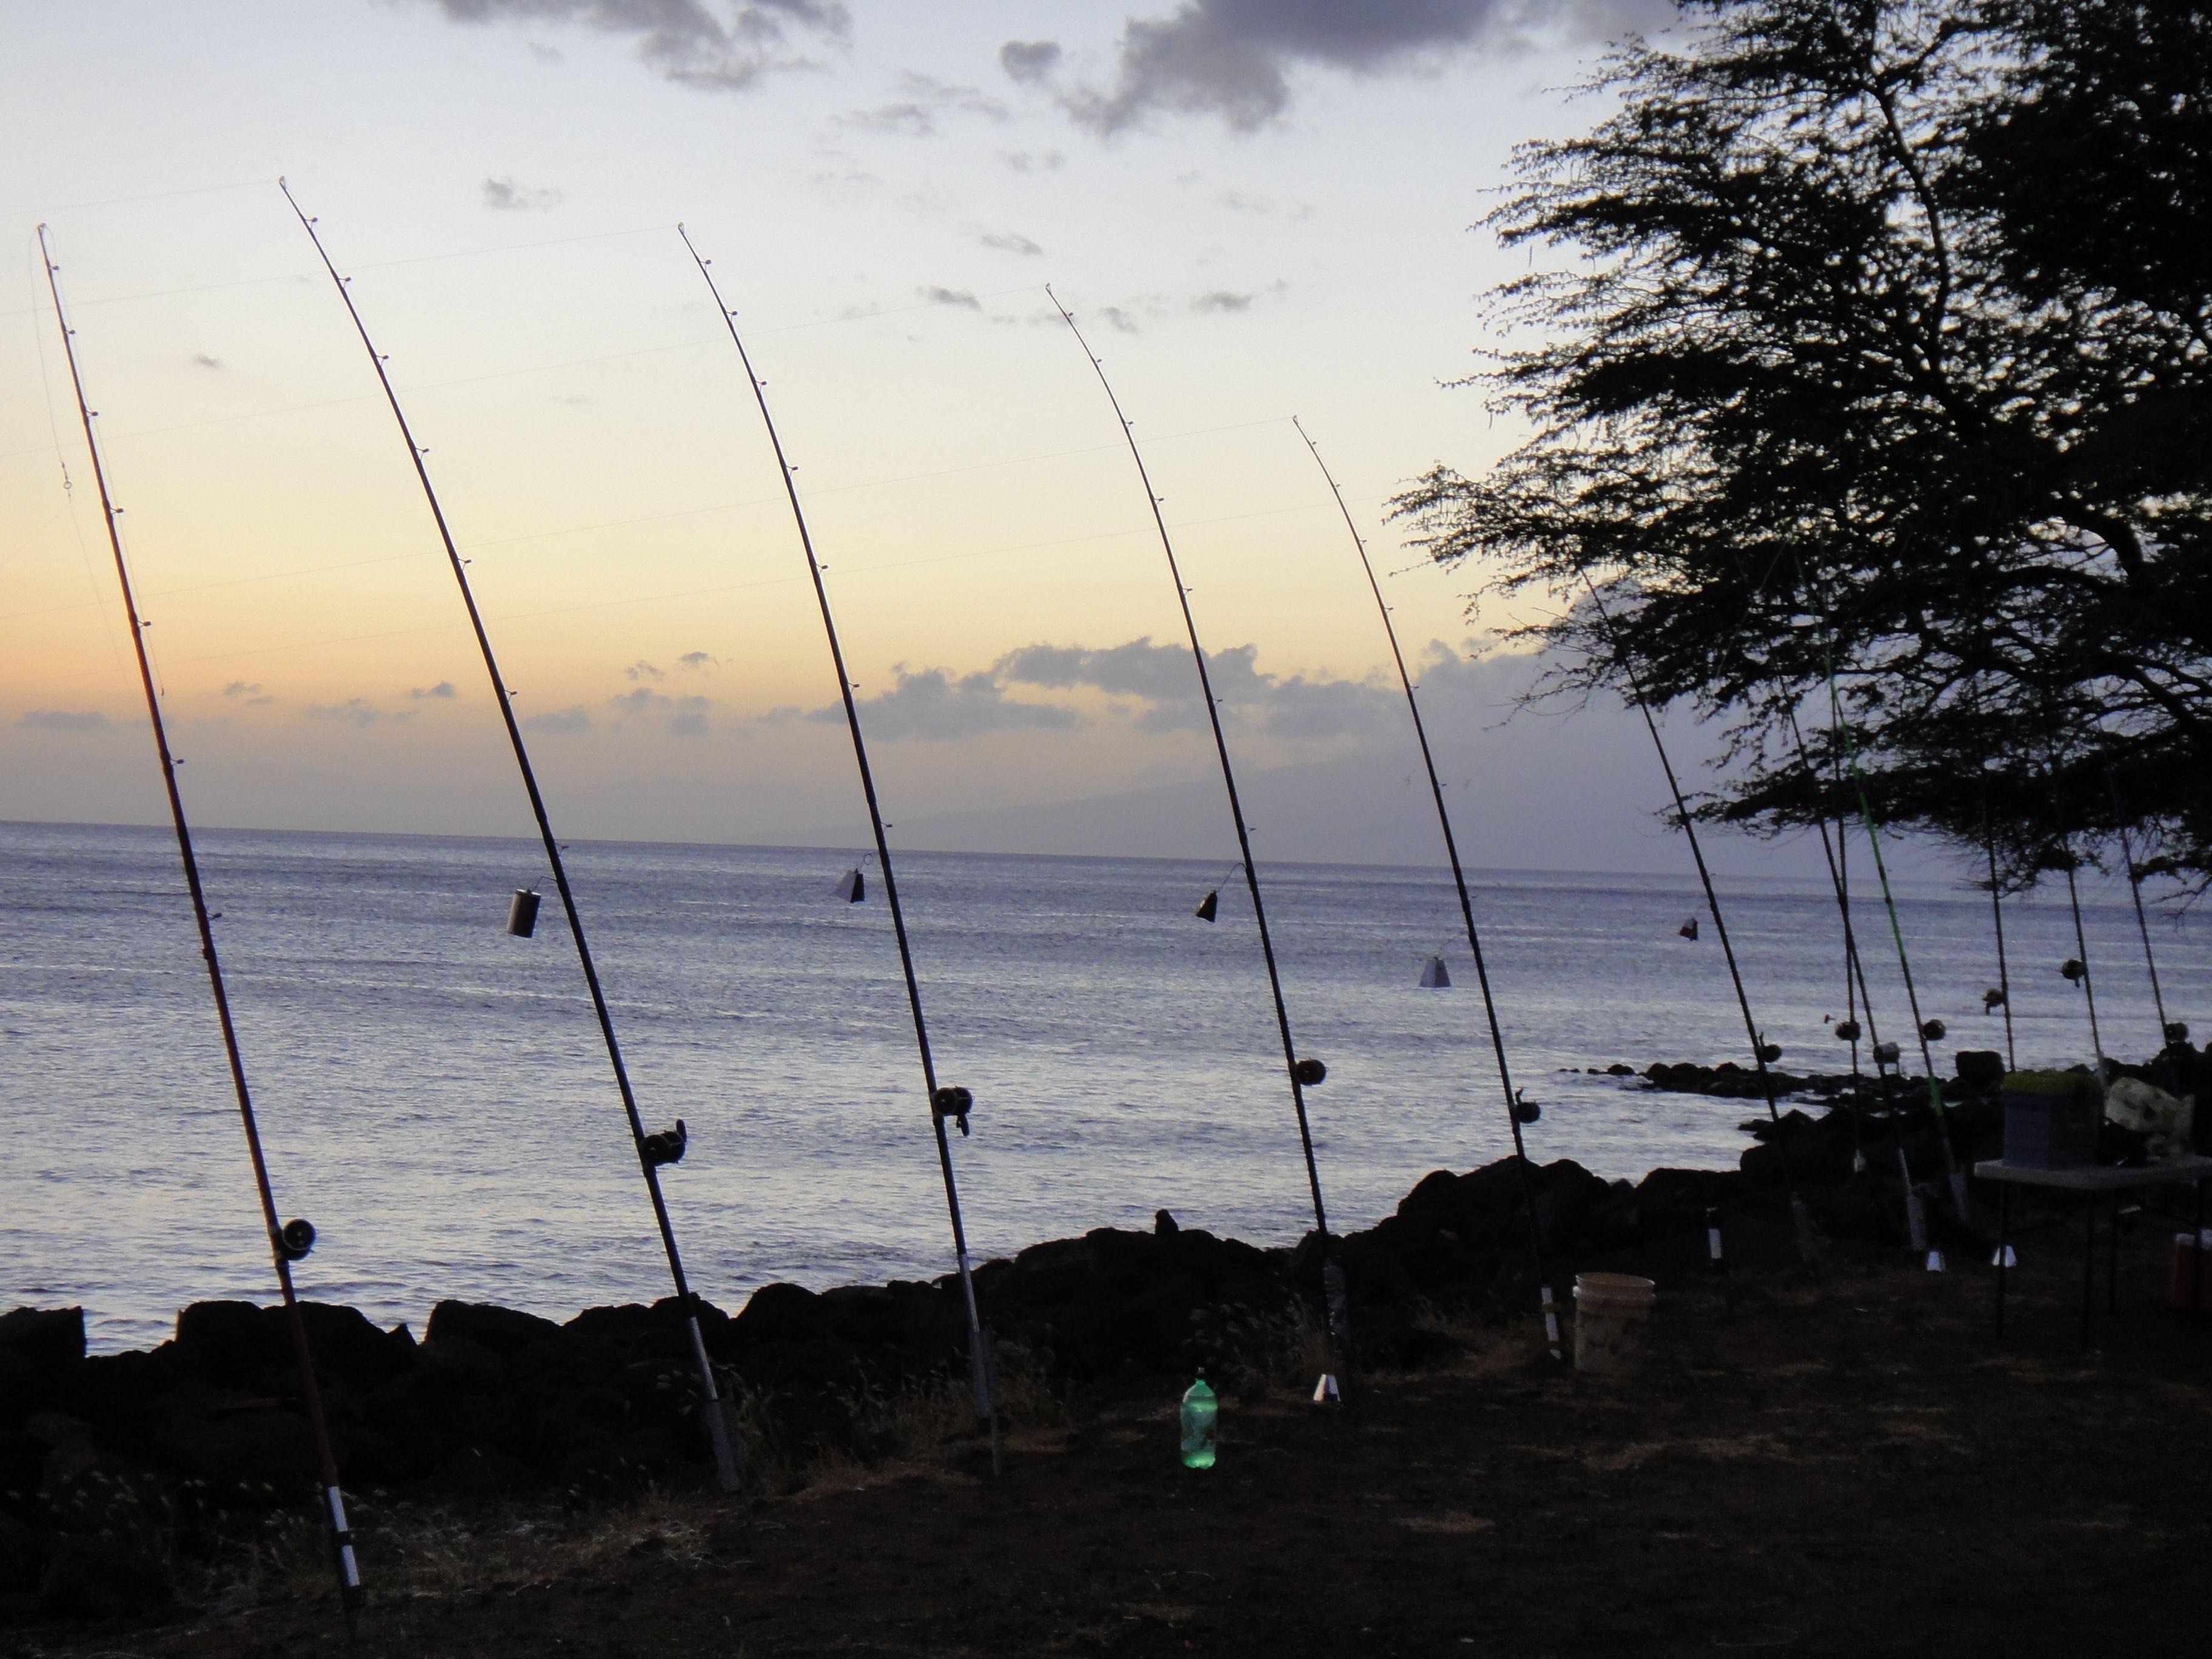 Ulua Fishing At Wahikuli Park In Lahaina The Ulua Fishermen Set Up Late In The Afternoons And Then Fish All Night Hawaii Fishing Fisherman Set Maui Hawaii